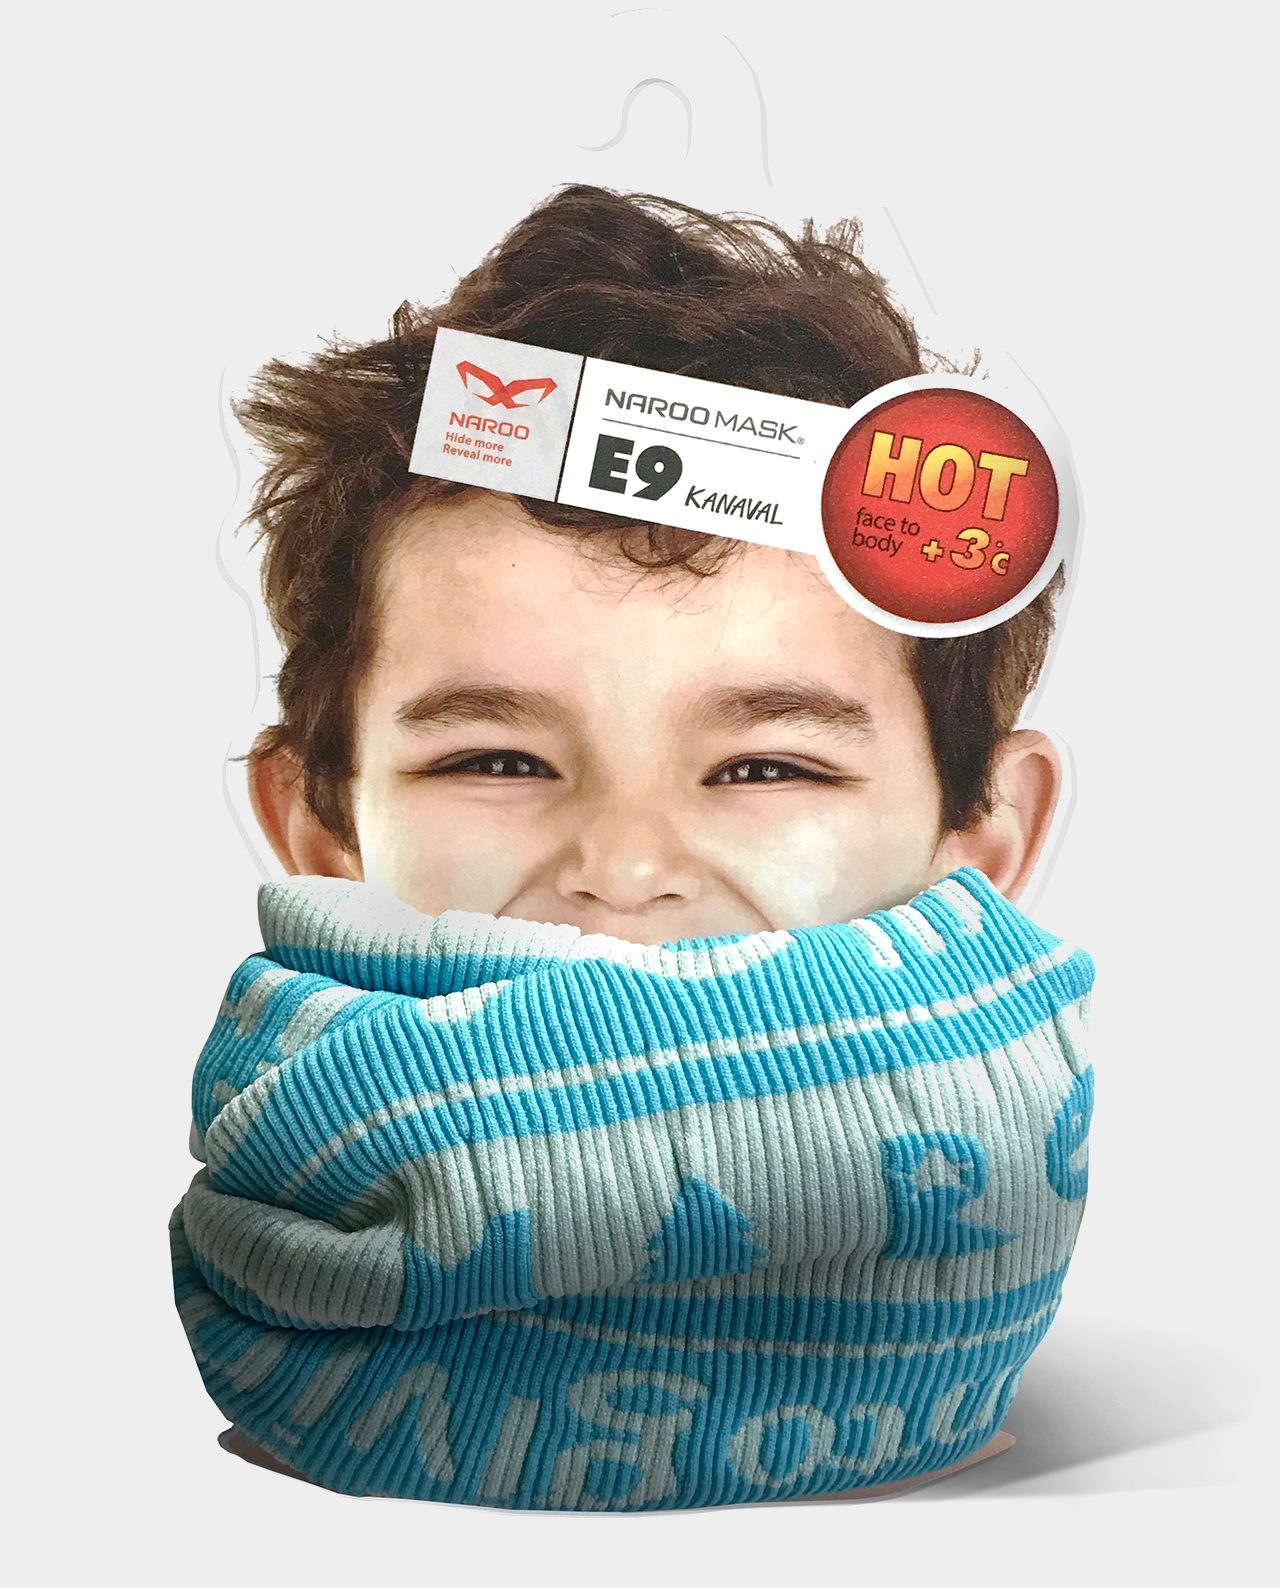 Esarfa multifunctionala pentru copii Naroo Mask E9 Kids - diverse modele imagine